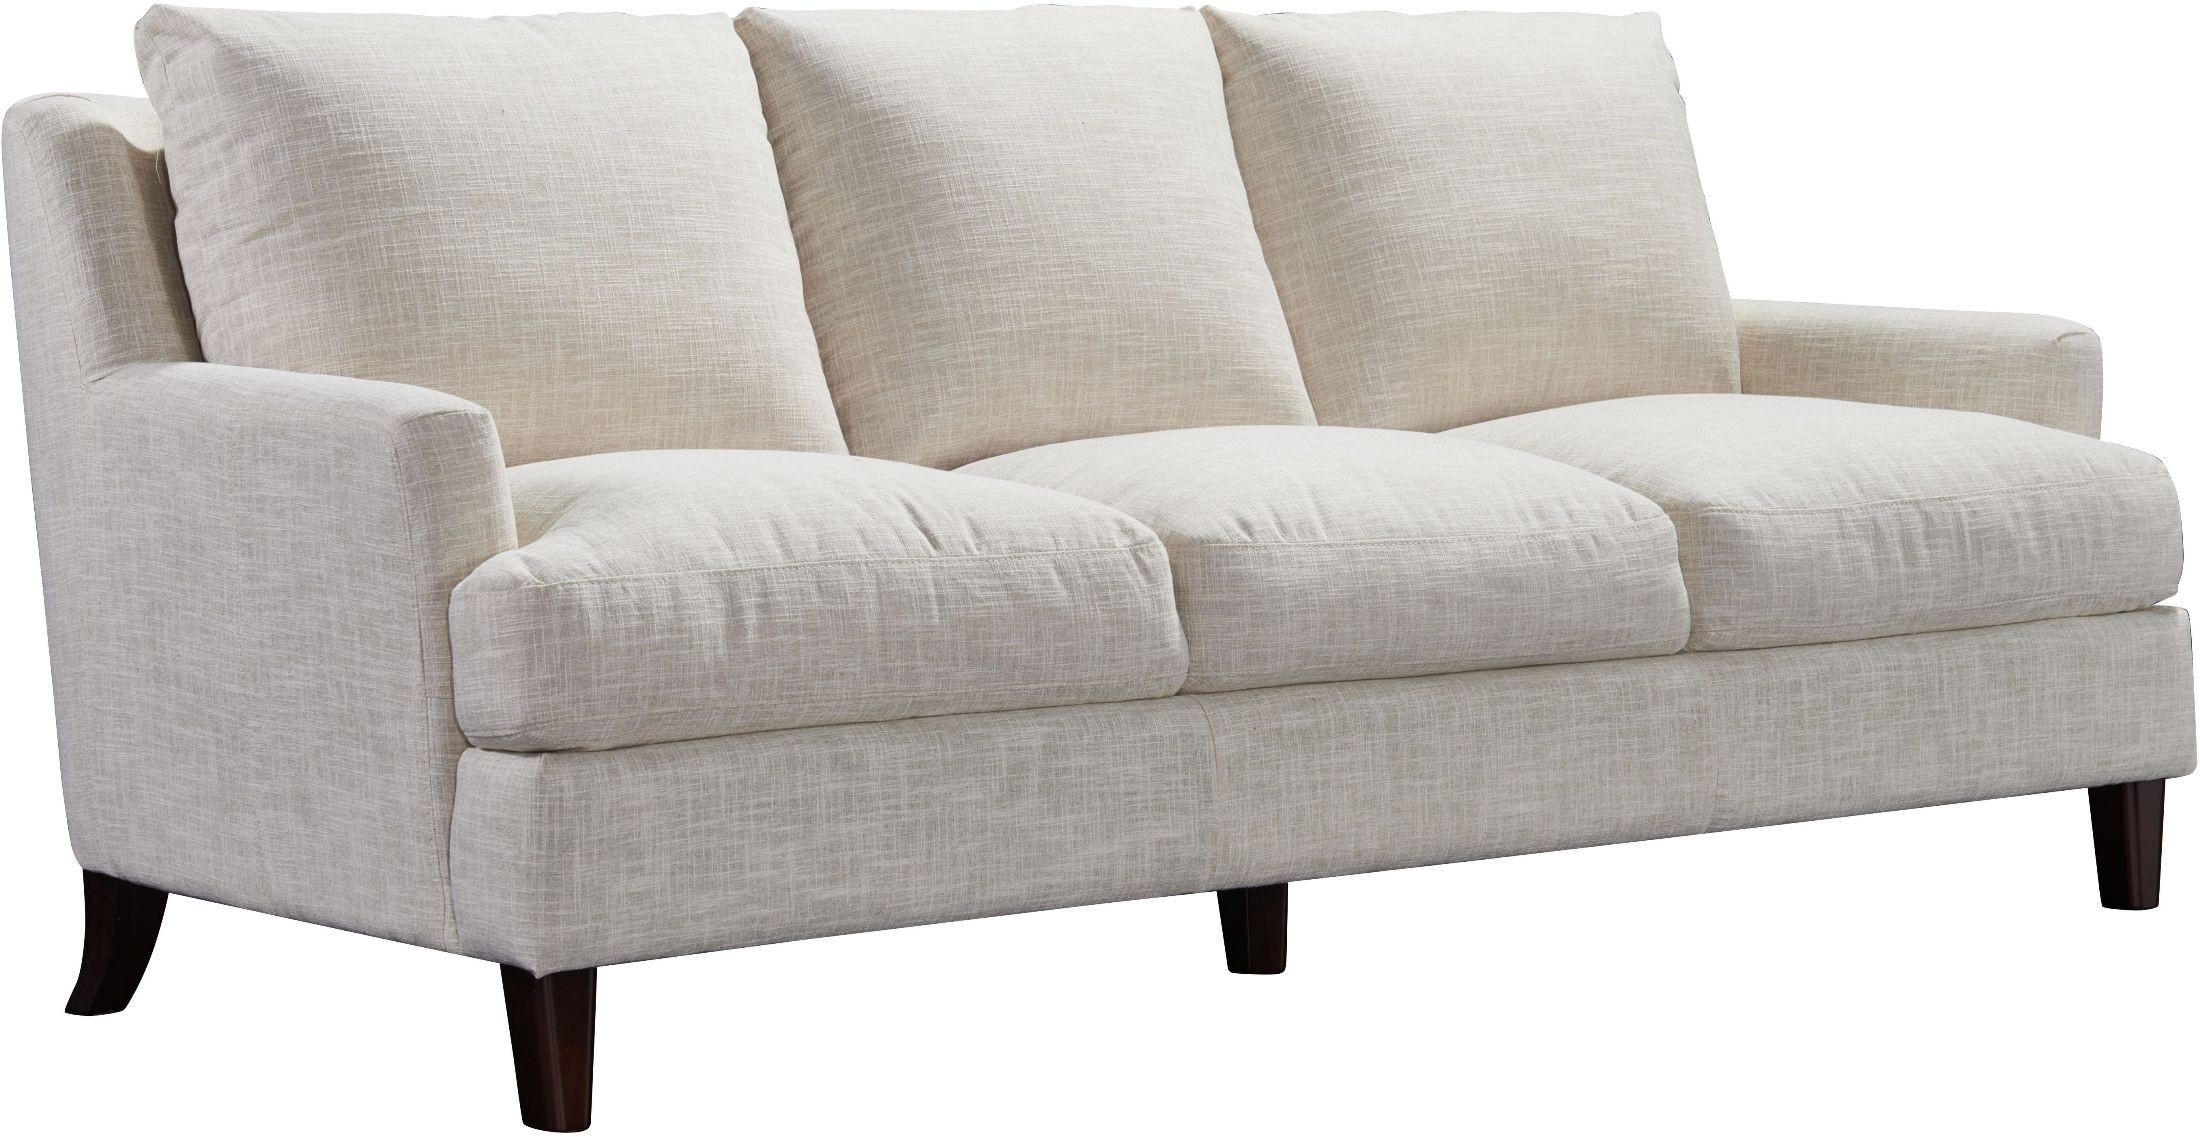 oatmeal sofa corner ikea bed georgetowne charleston from luxe leather